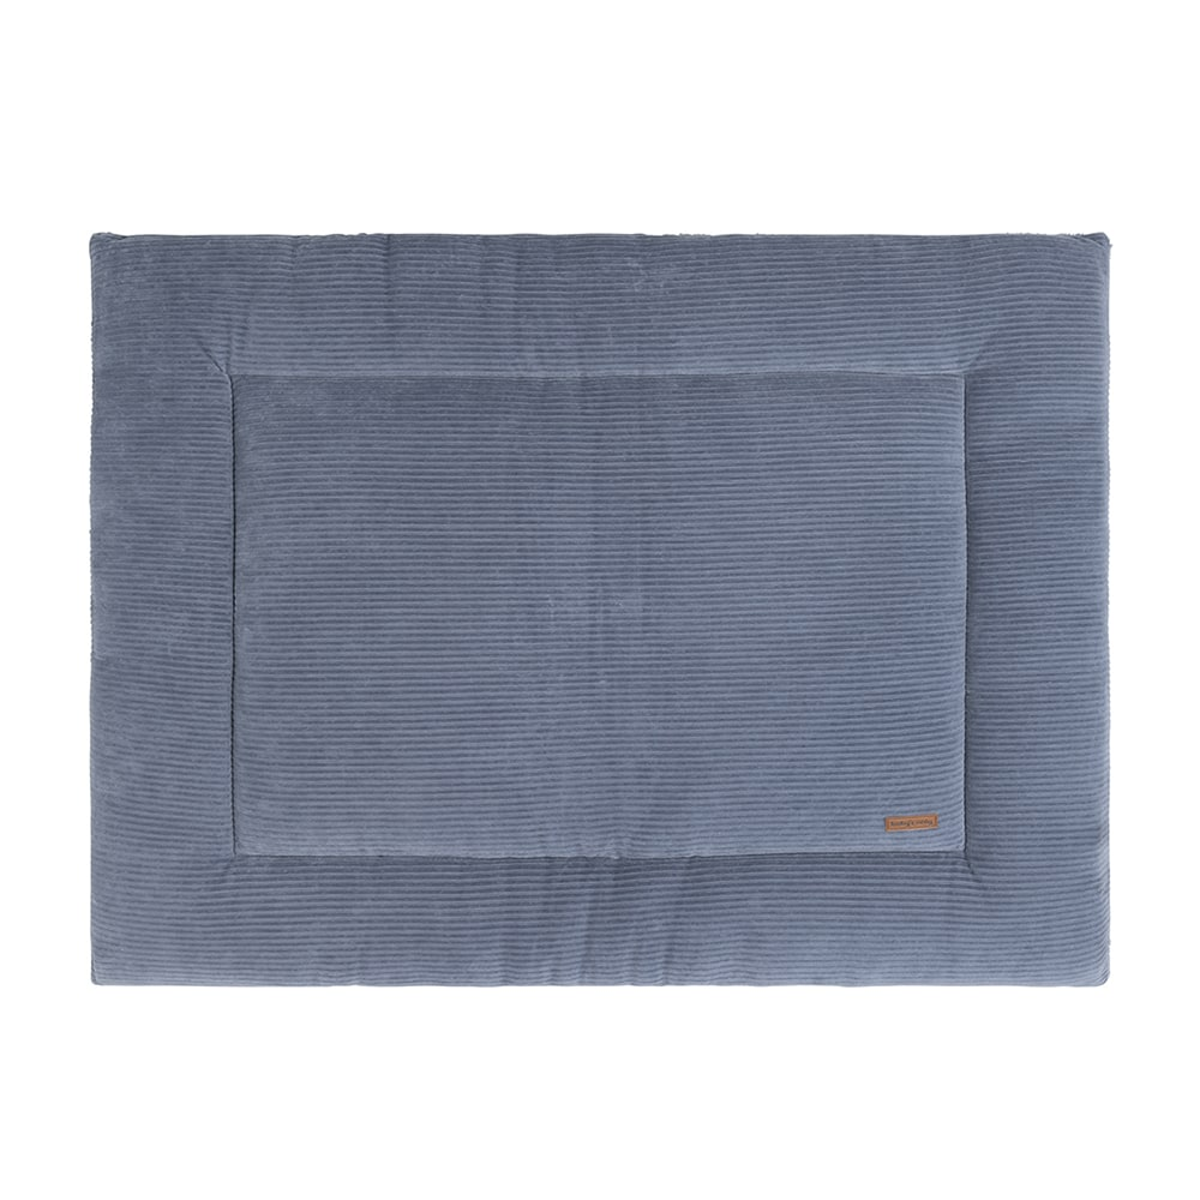 babys only bo02400203848 boxkleed 75x95 cm sense vintage blue 1